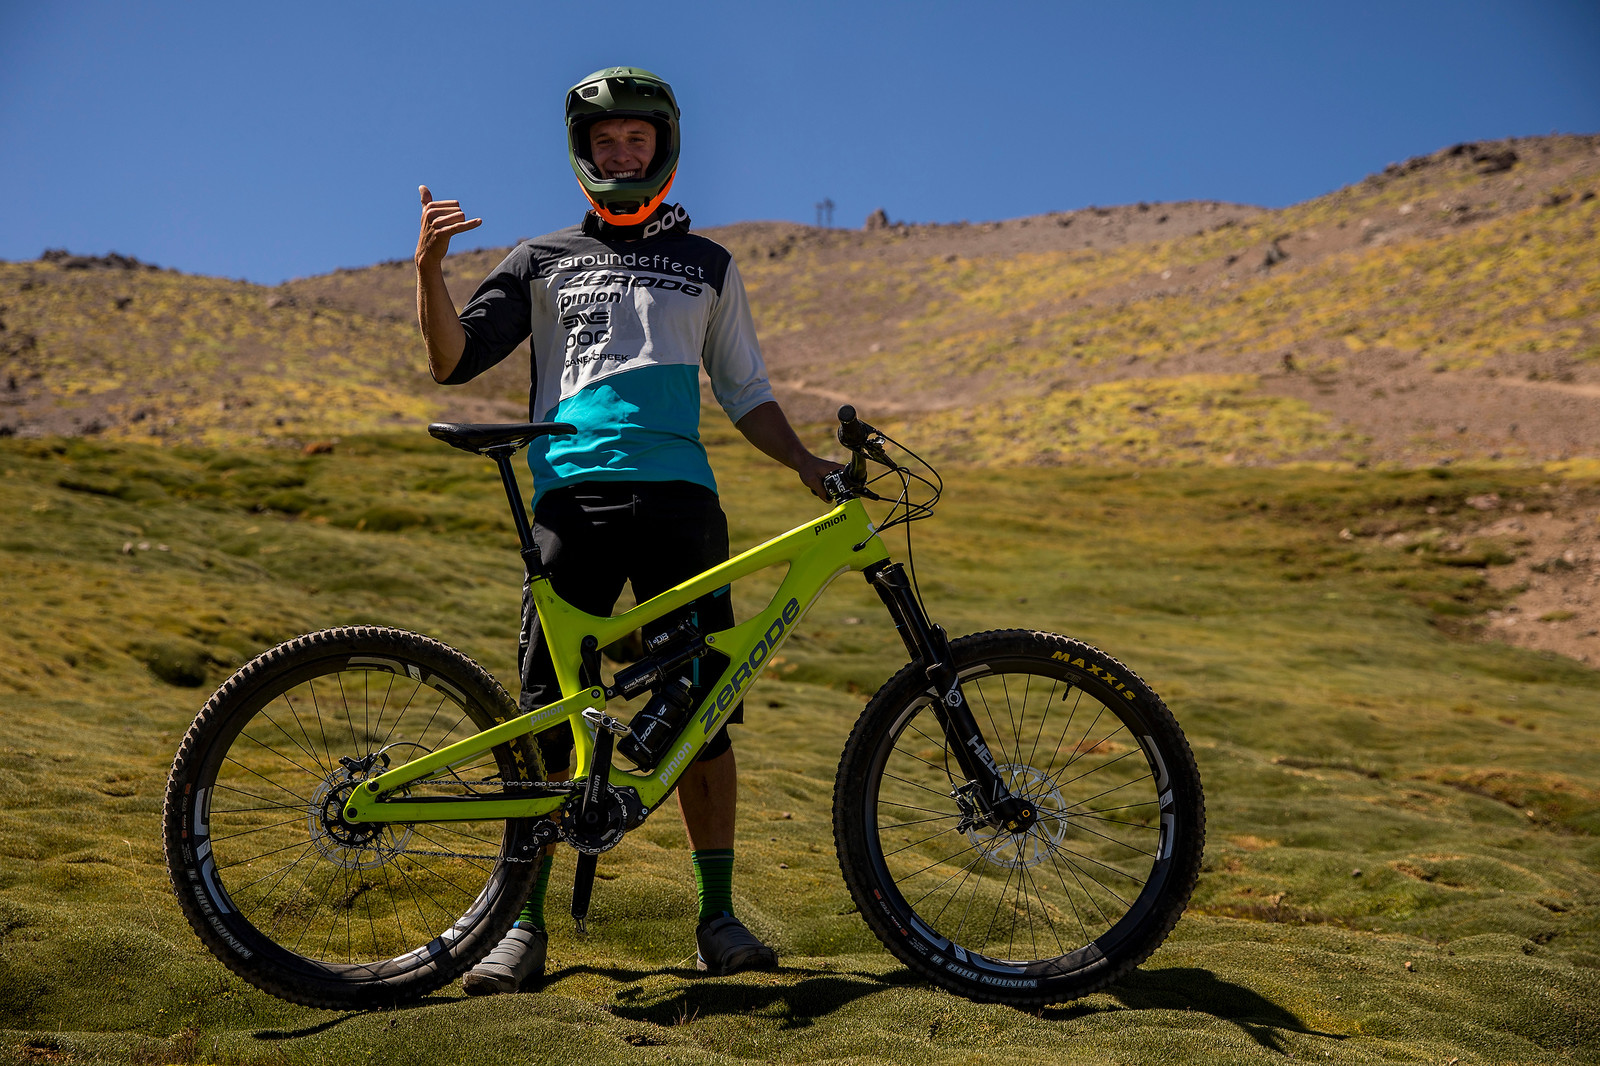 Sam Shaw's Zerode Taniwha - PIT BITS AND BIKES - Enduro World Series, Chile - Mountain Biking Pictures - Vital MTB